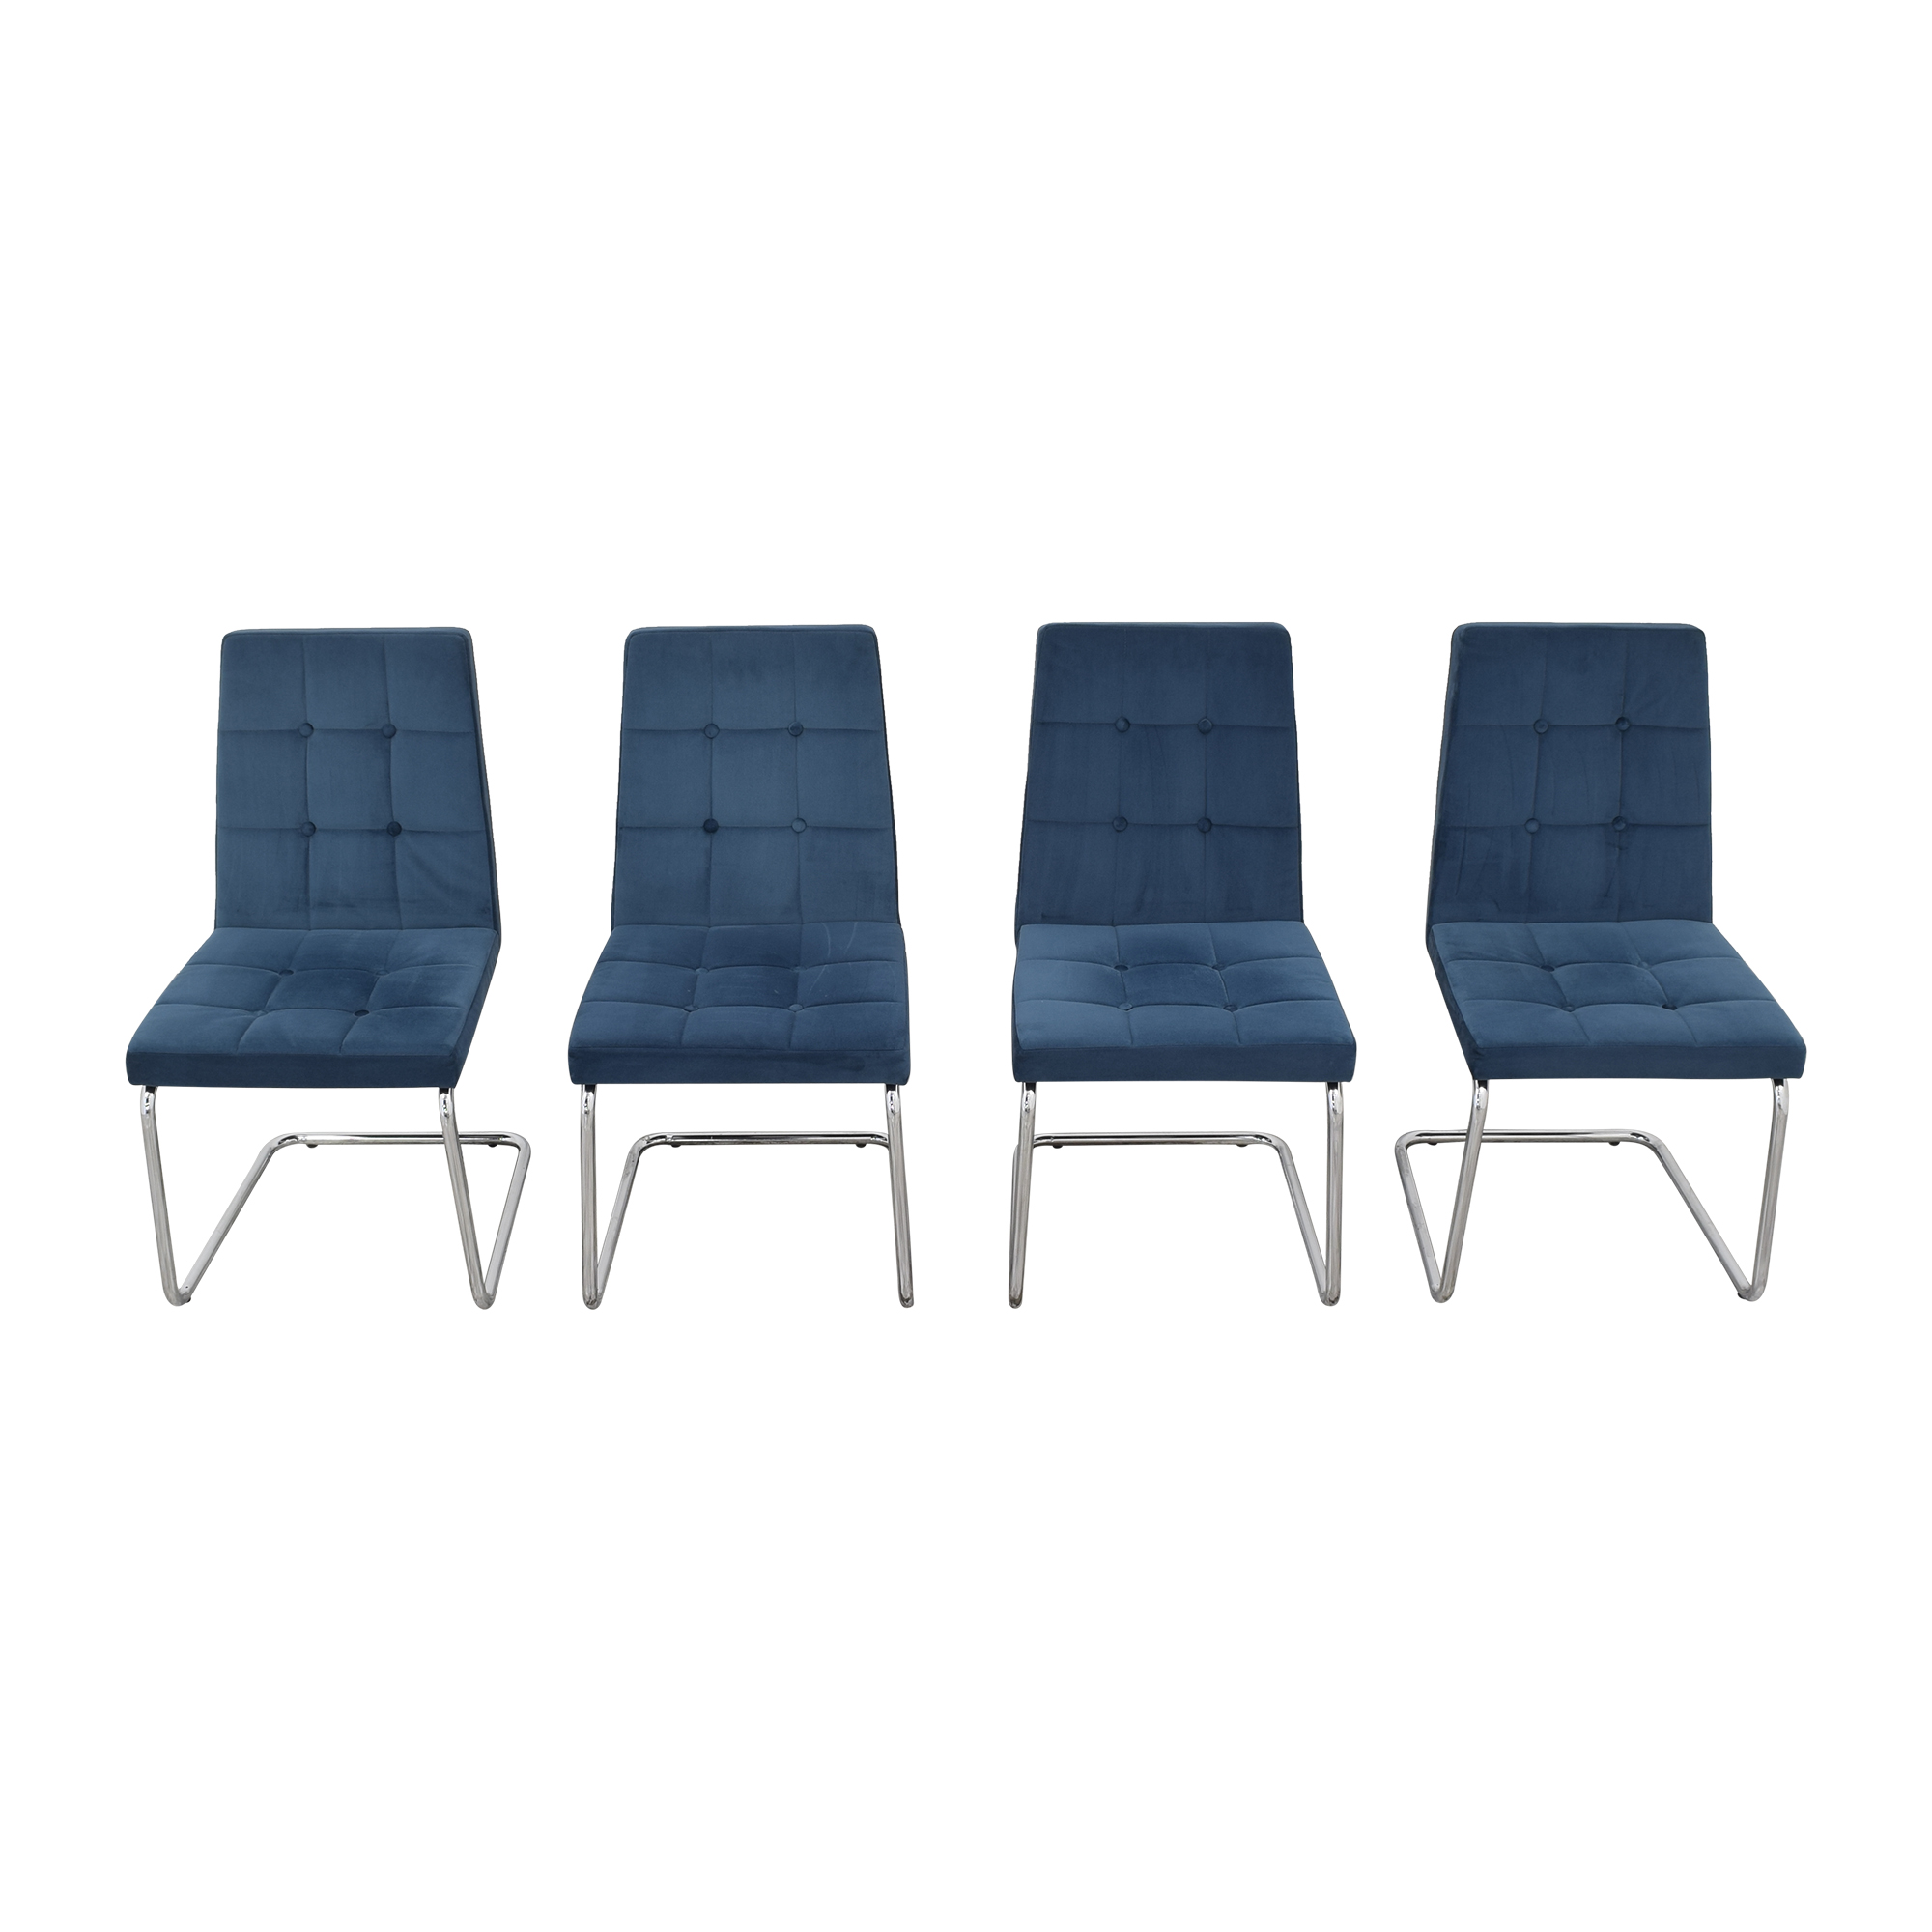 CB2 CB2 Roya Chairs Slate Blue used